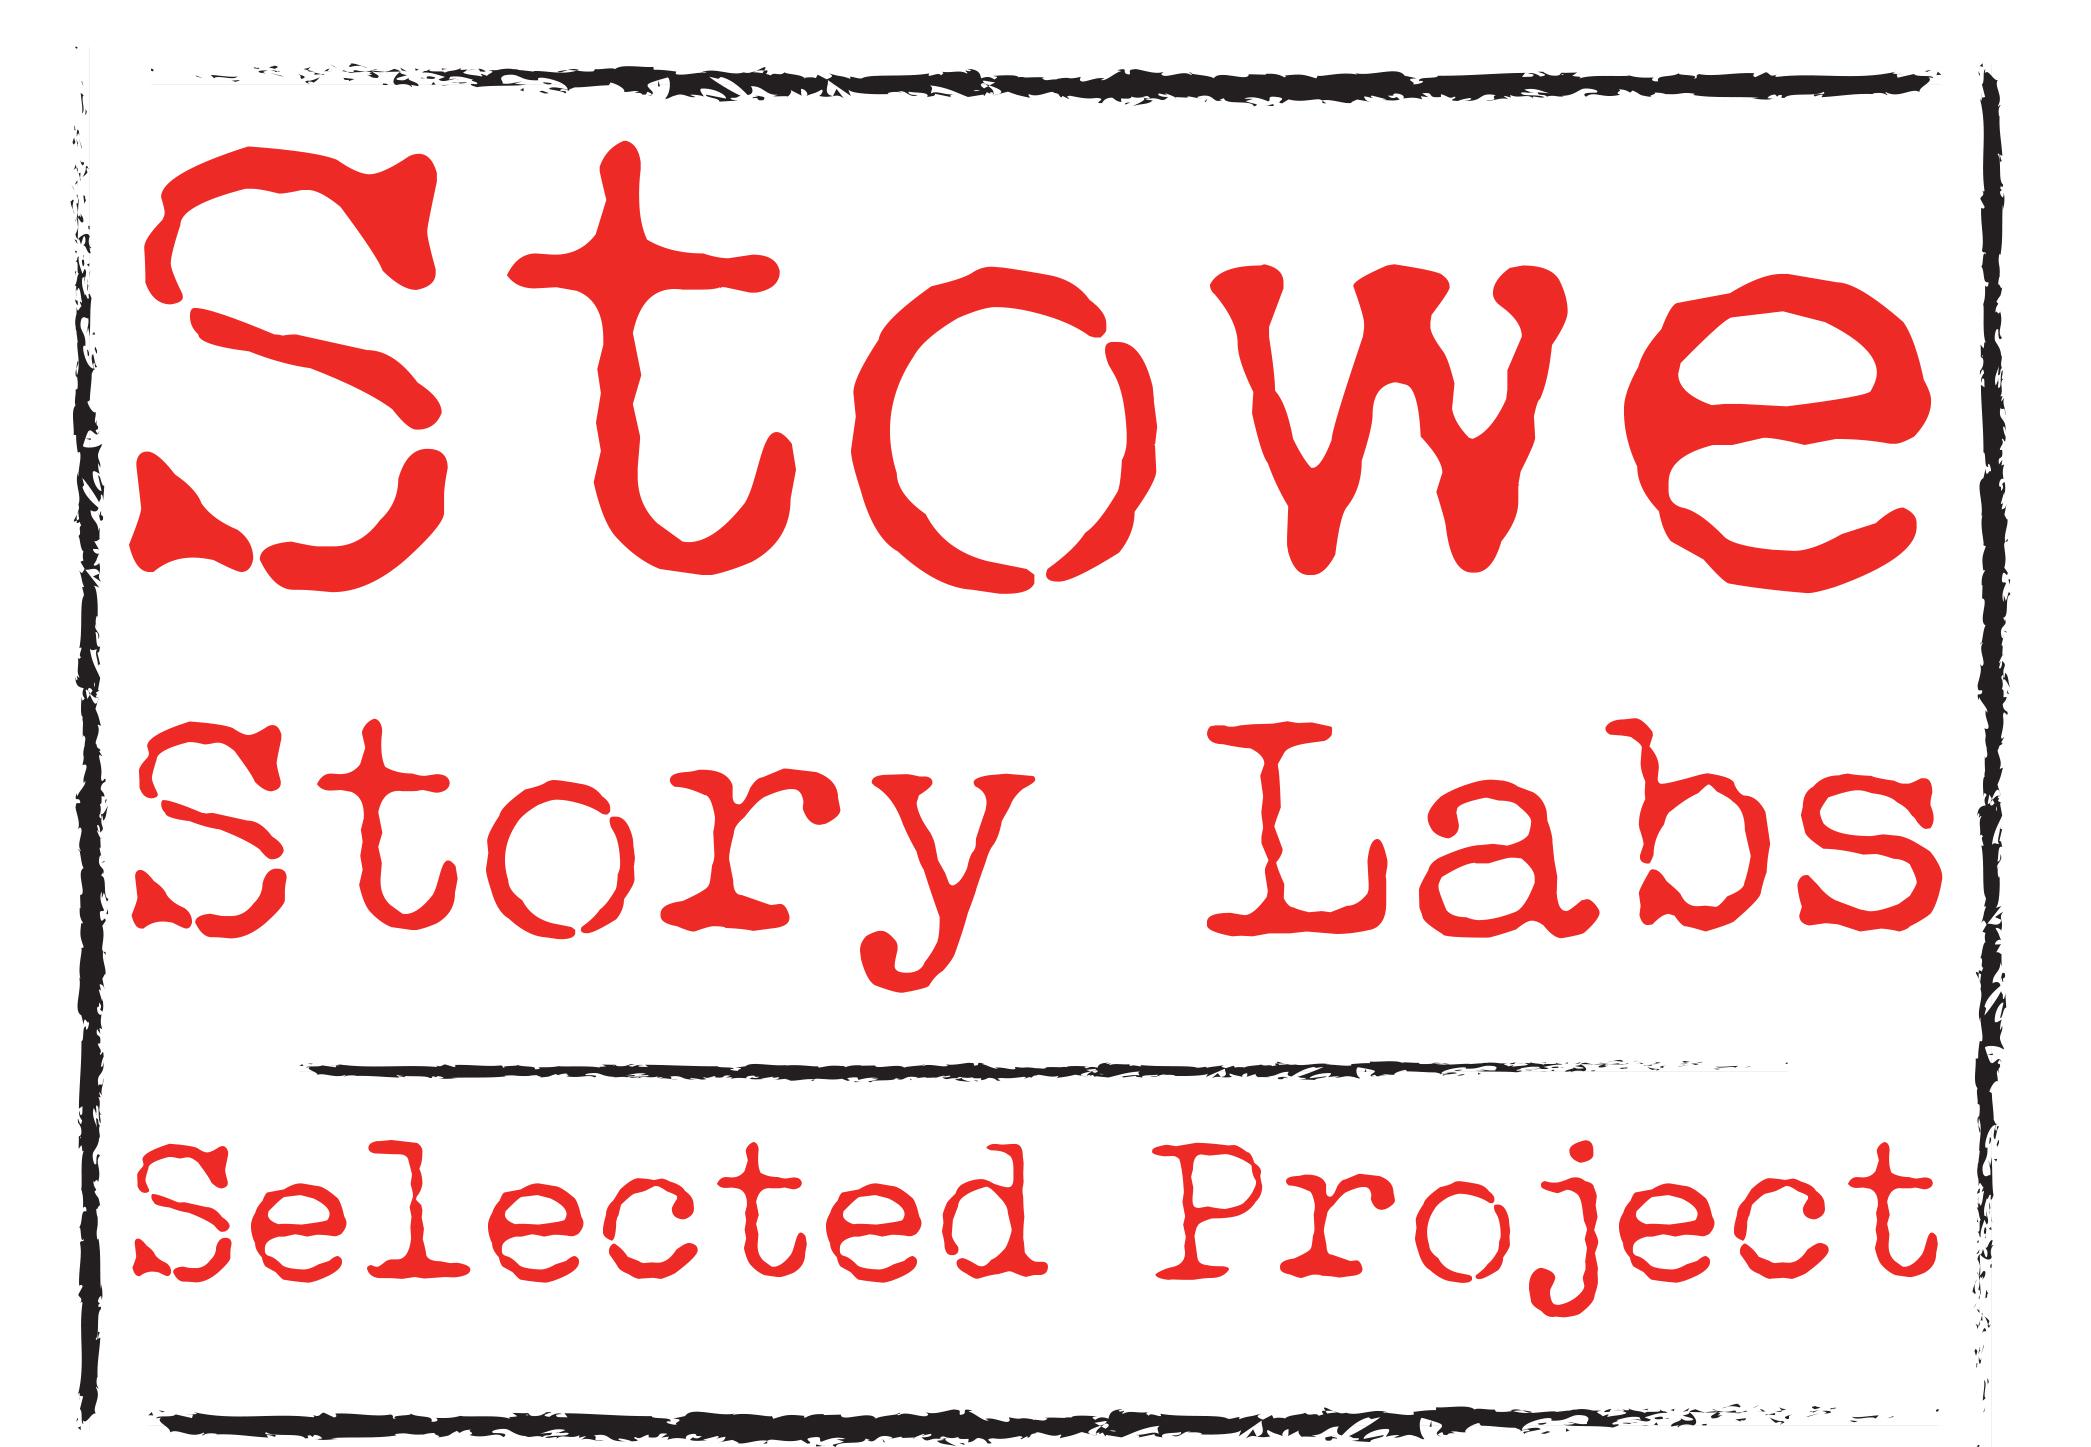 selected project logo.jpeg